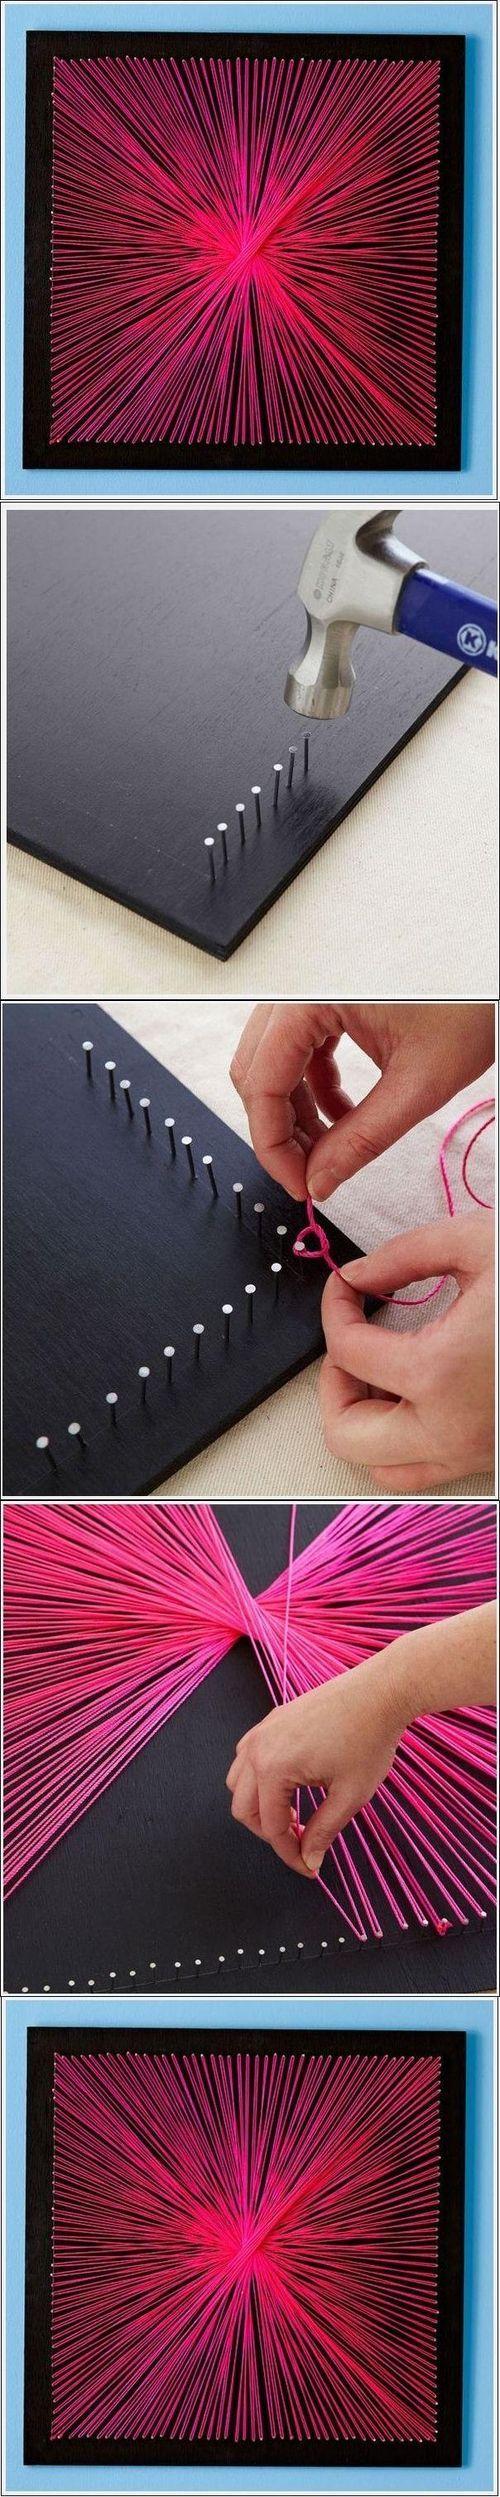 DIY String Art DIY Projects / UsefulDIY.com